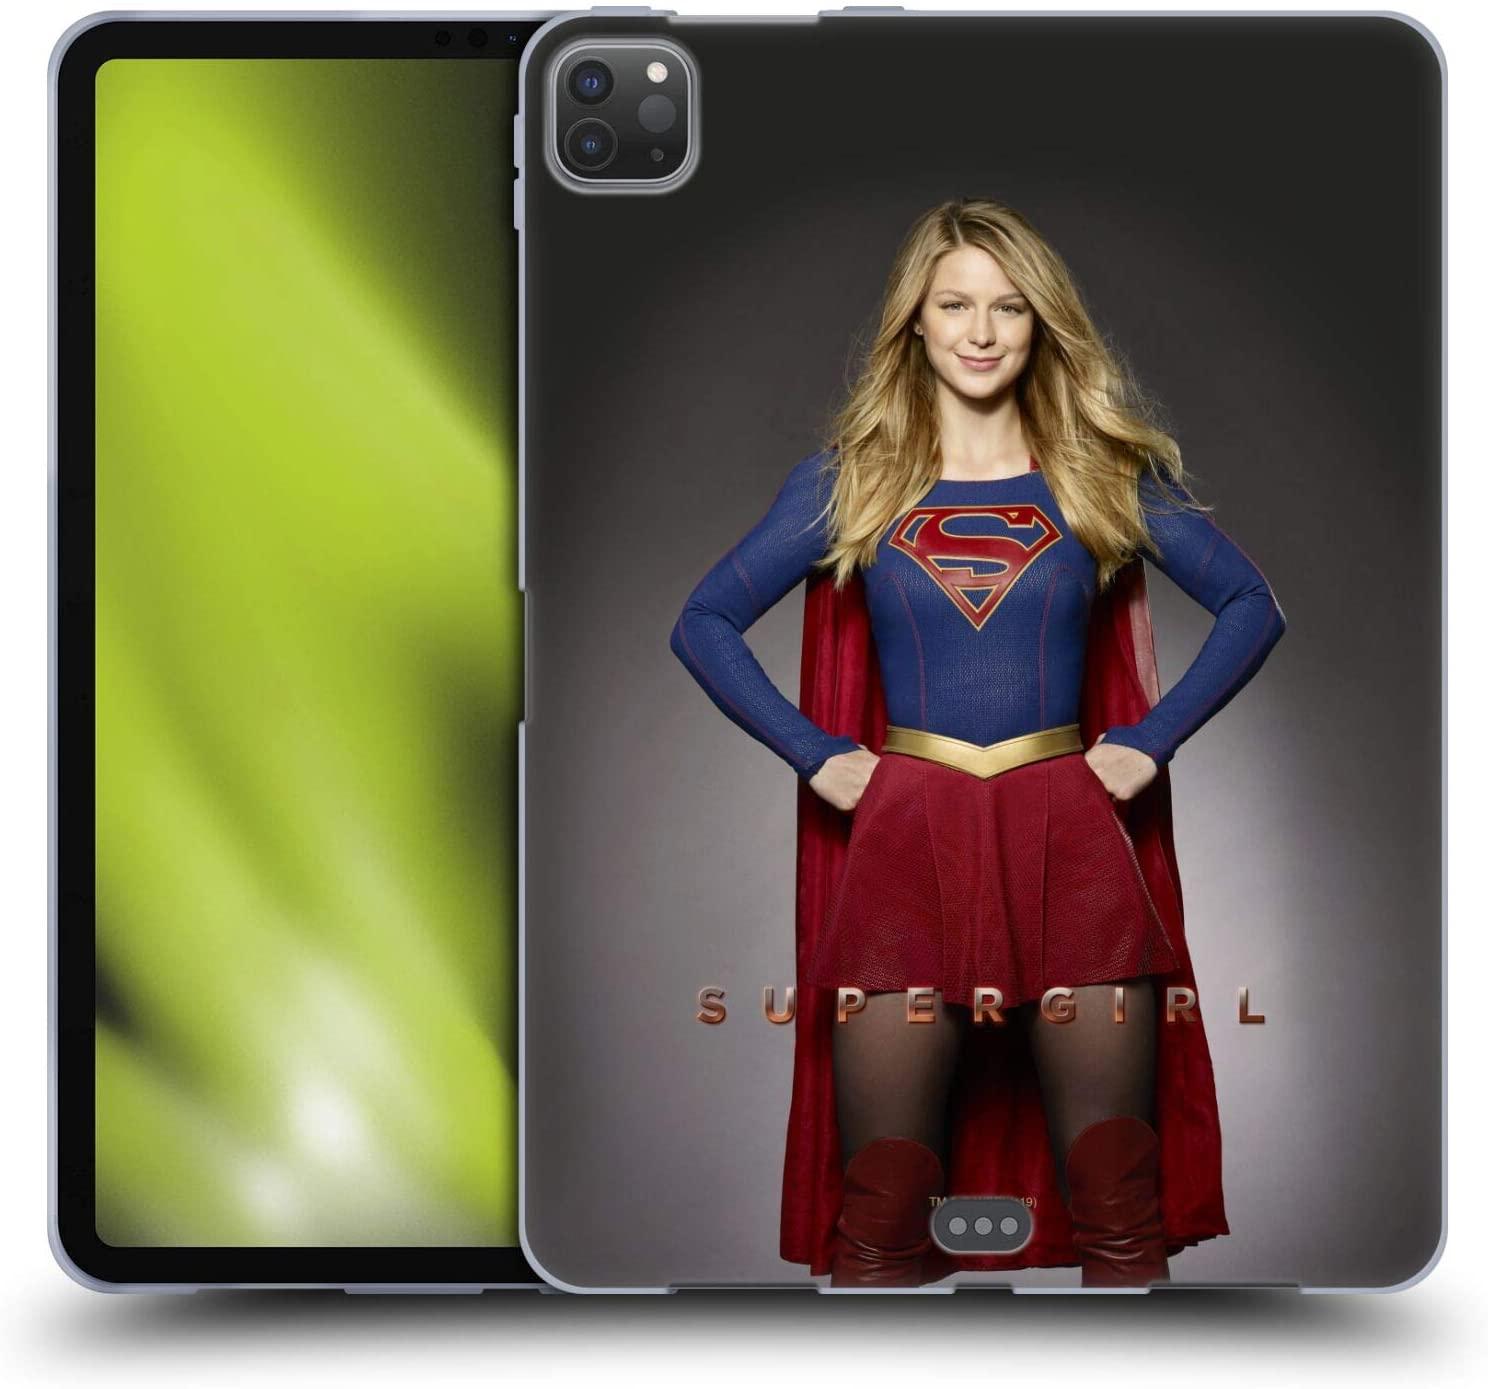 Head Case Designs Officially Licensed Supergirl TV Series Kara Zor-El Key Art Soft Gel Case Compatible with Apple iPad Pro 11 (2020)